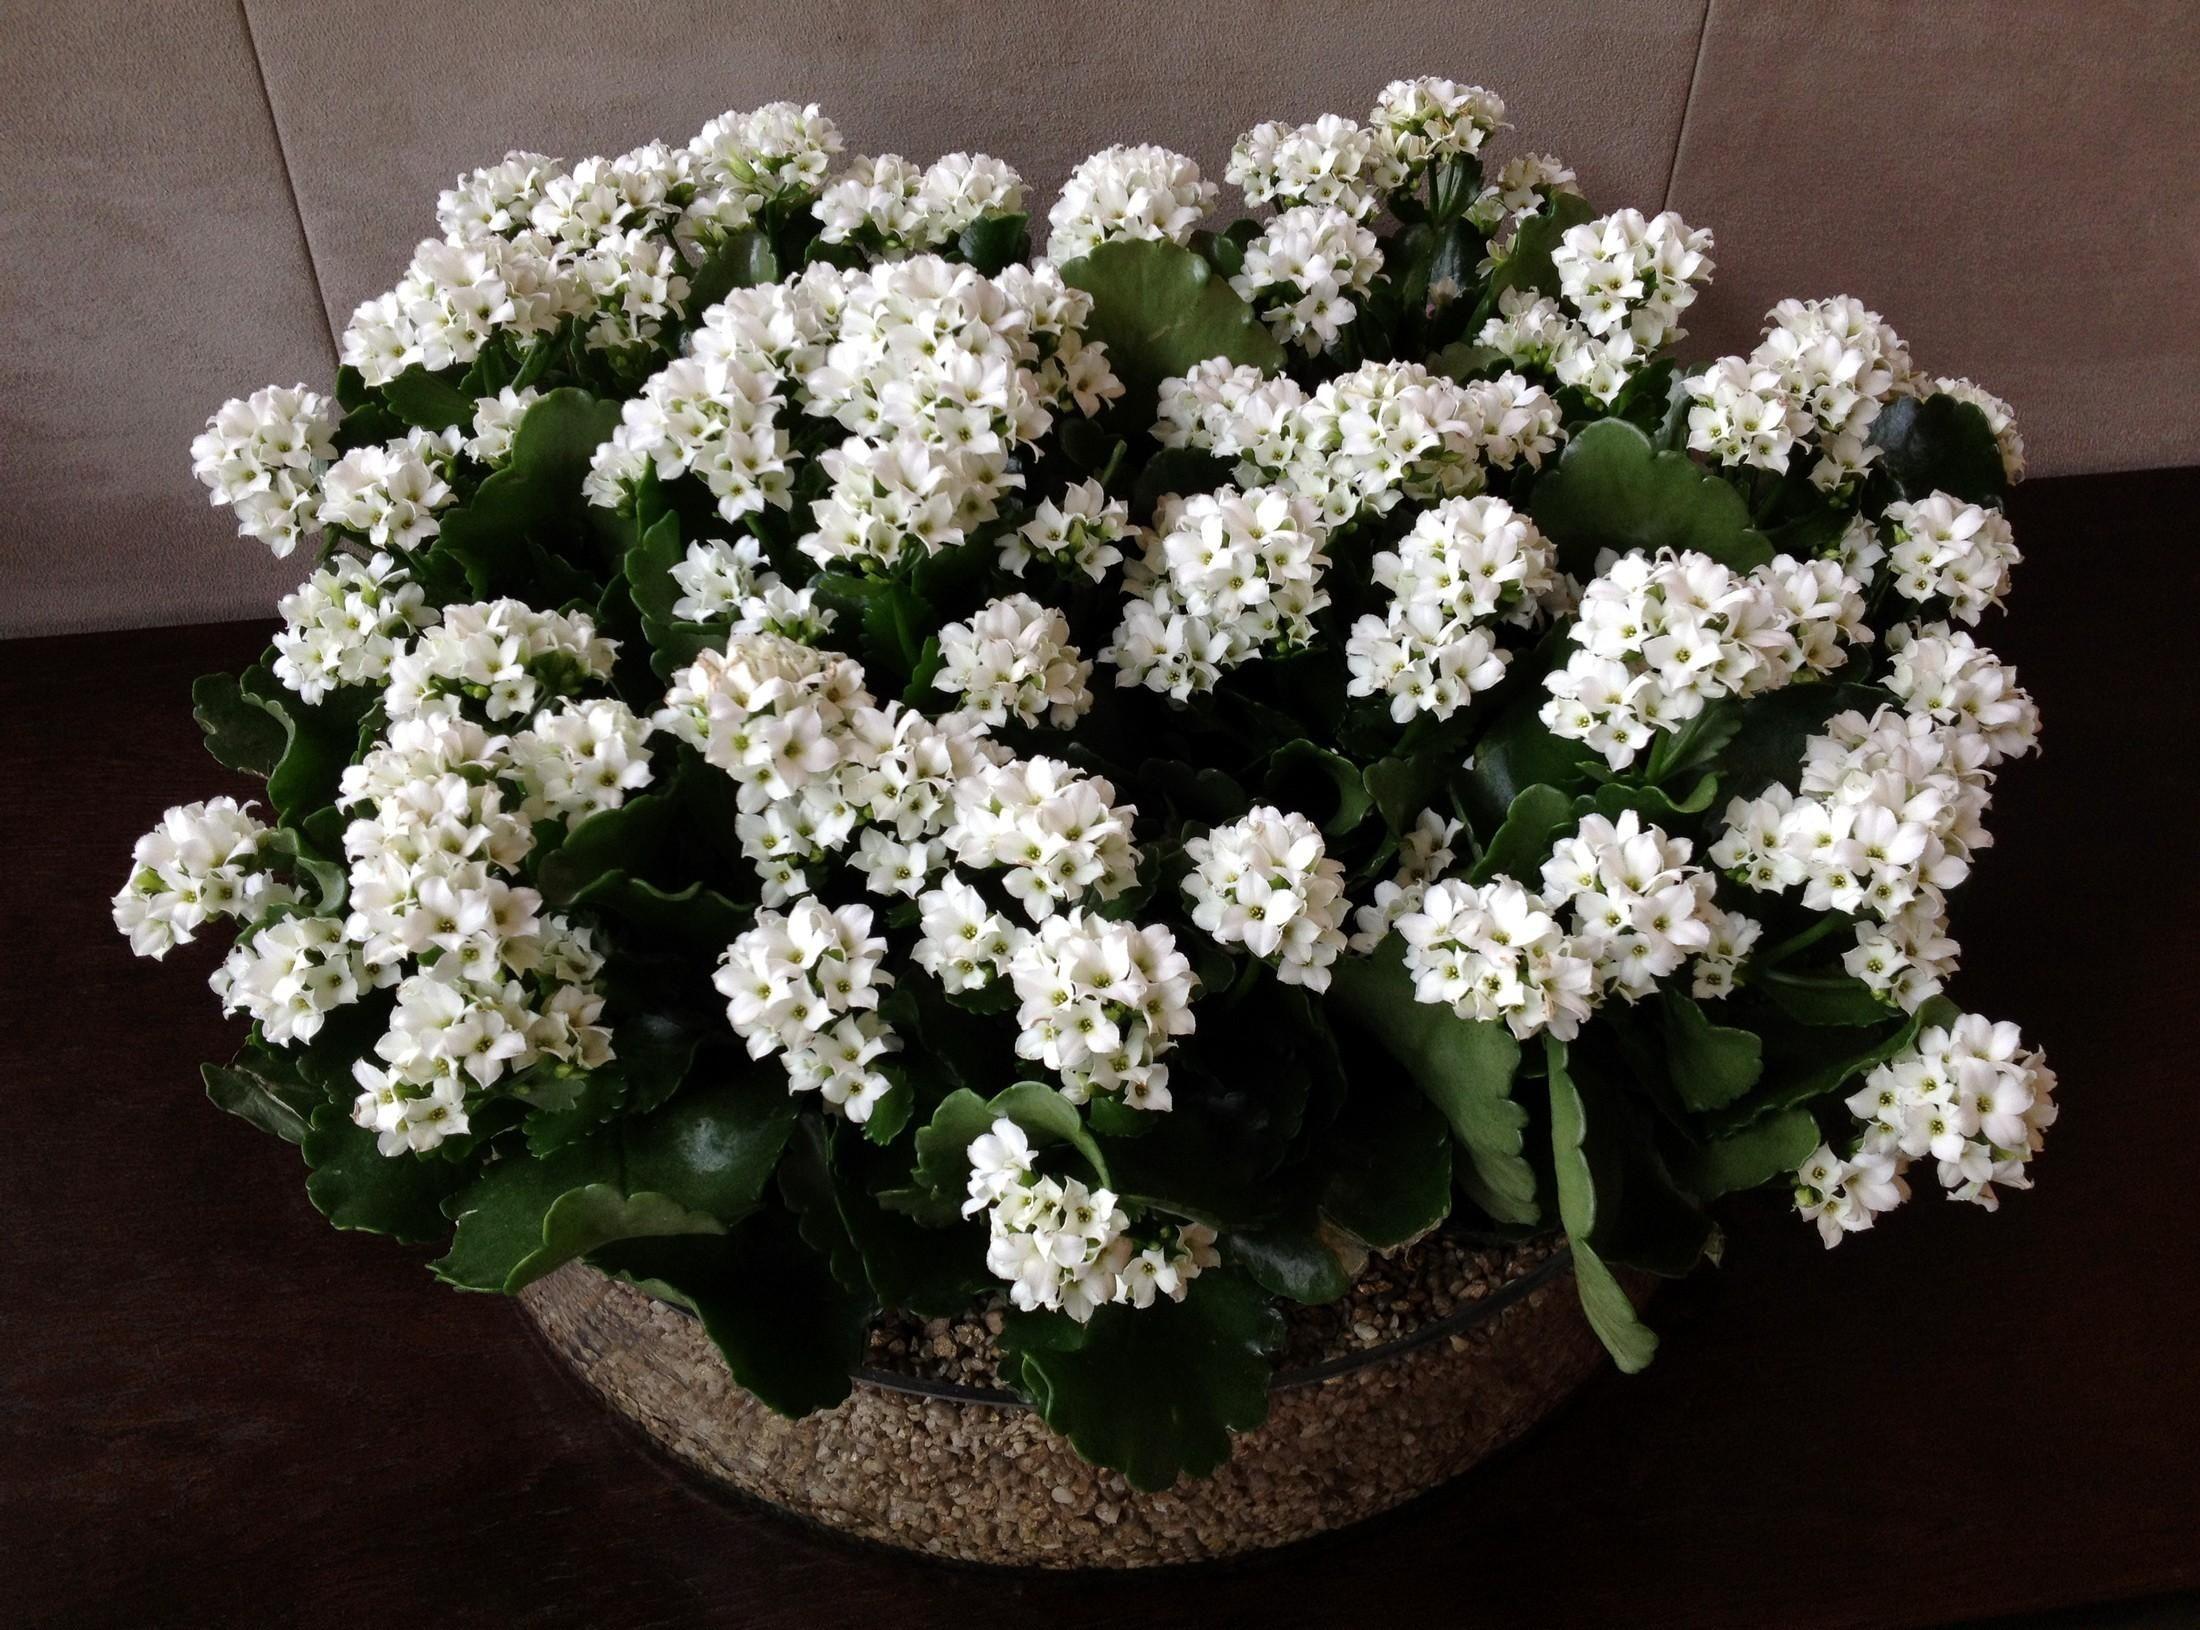 2200x1630 wallpaper kalanchoe flowers white indoor plant pots 2200x1630 wallpaper kalanchoe flowers white indoor plant pots mightylinksfo Choice Image